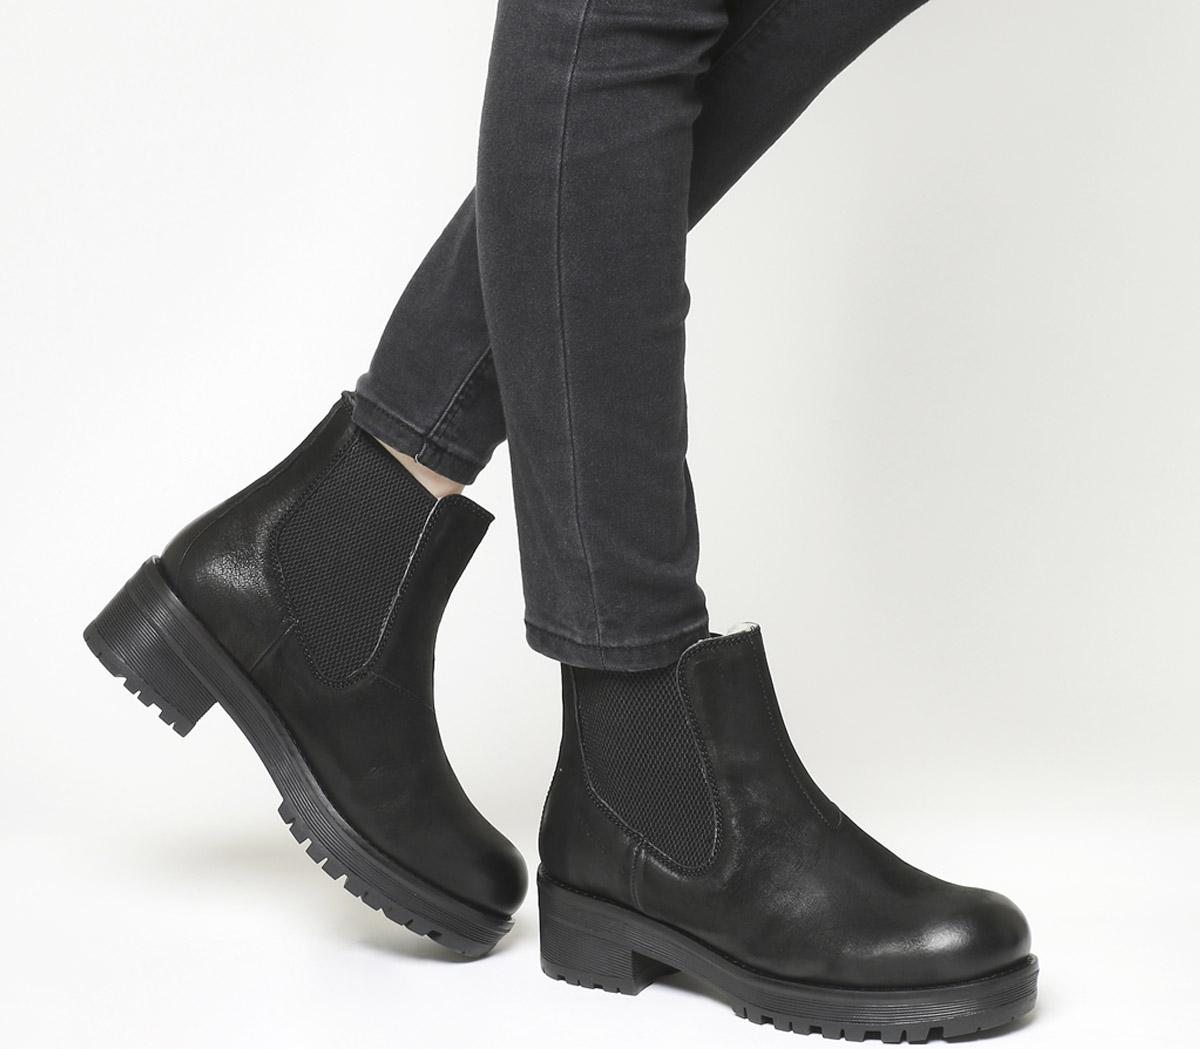 Clarisse Chelsea Boots